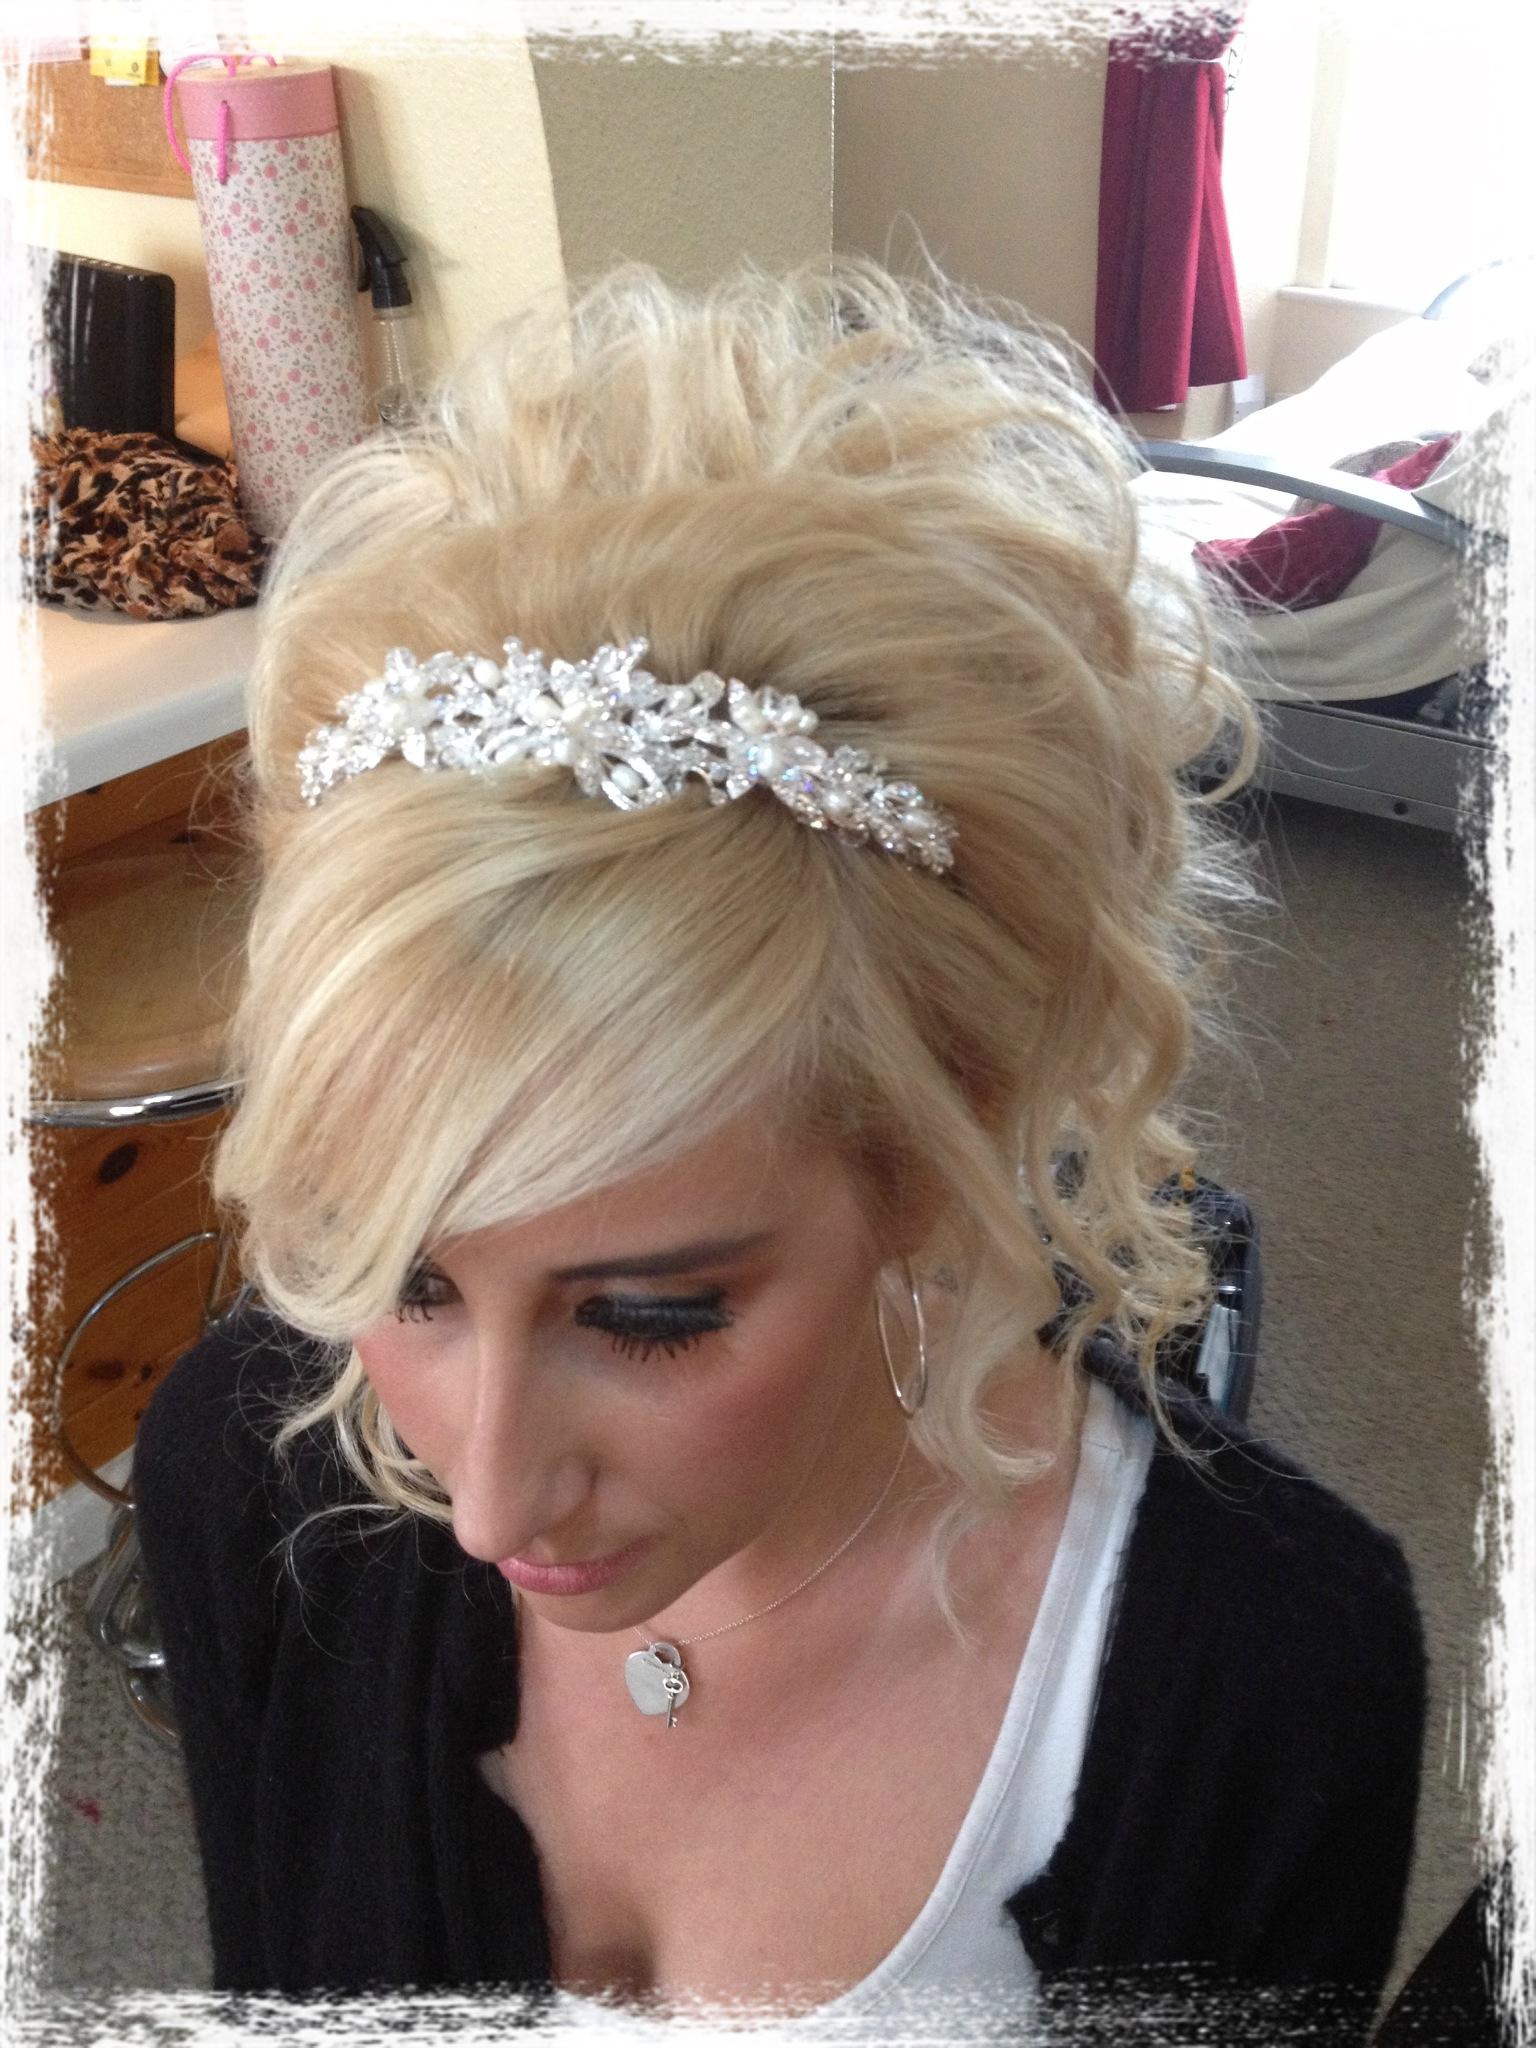 portfolio | wedding hair and makeup plymouth, devon and cornwall